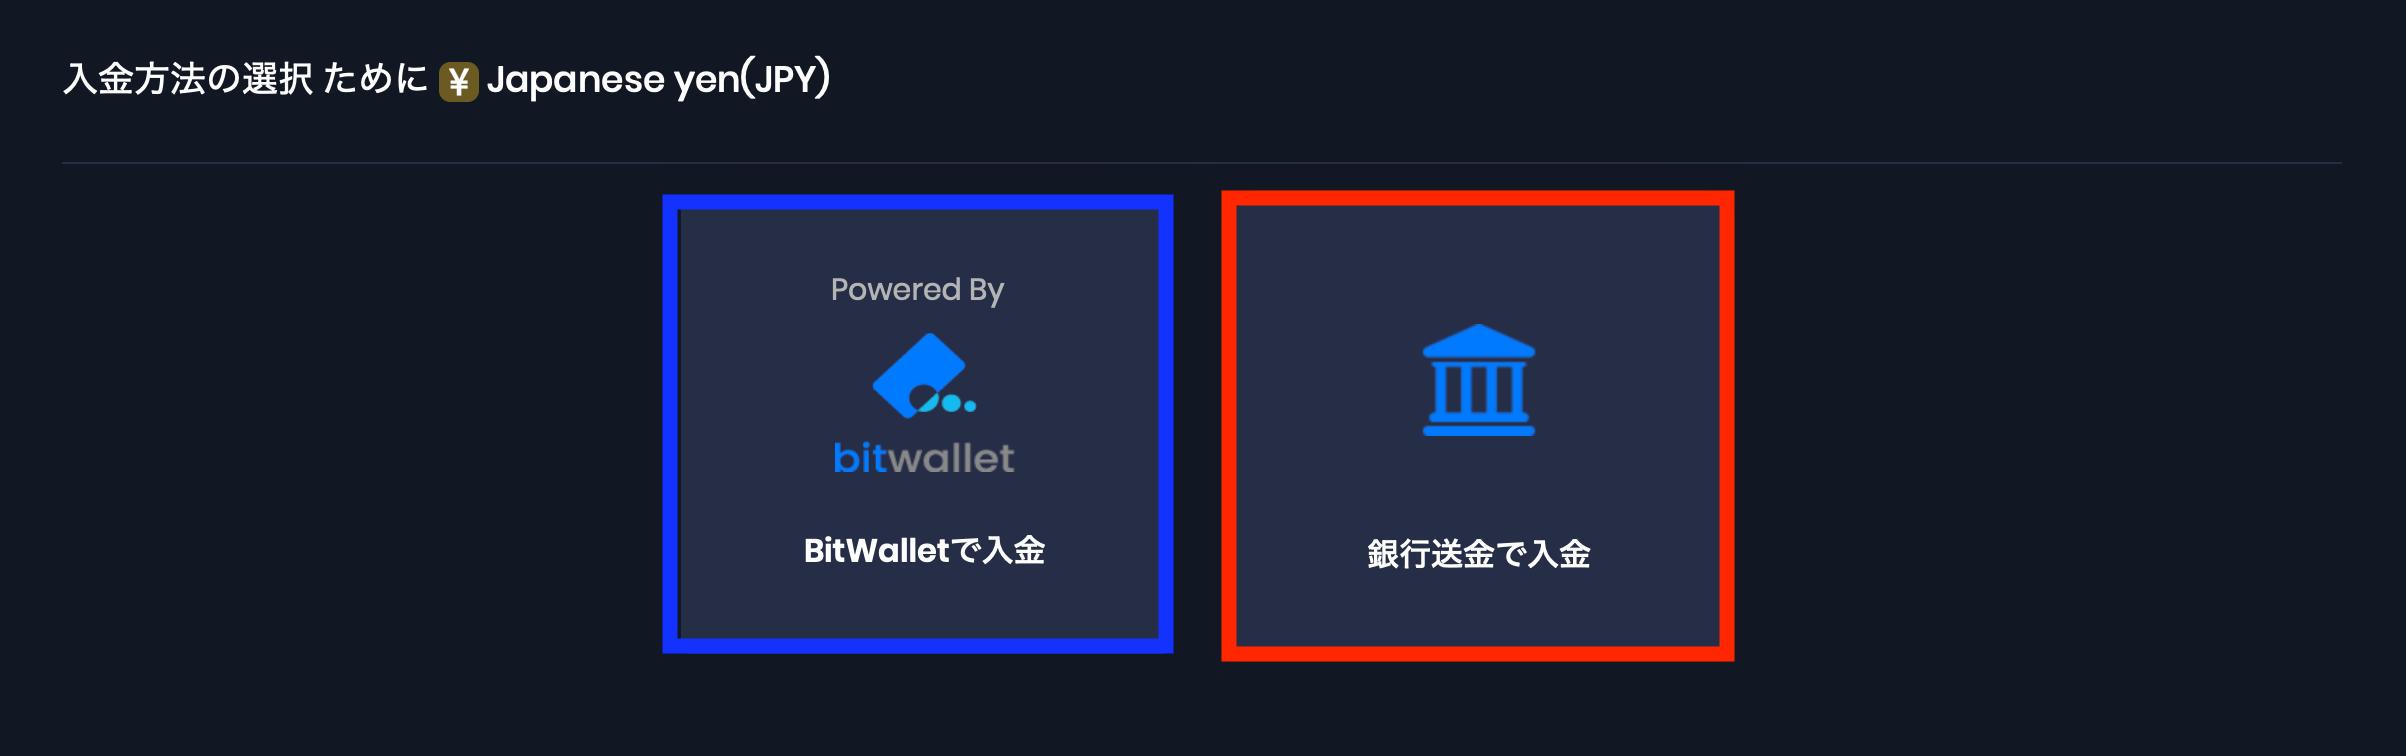 Bitwallet入金か海外銀行送金かを選択